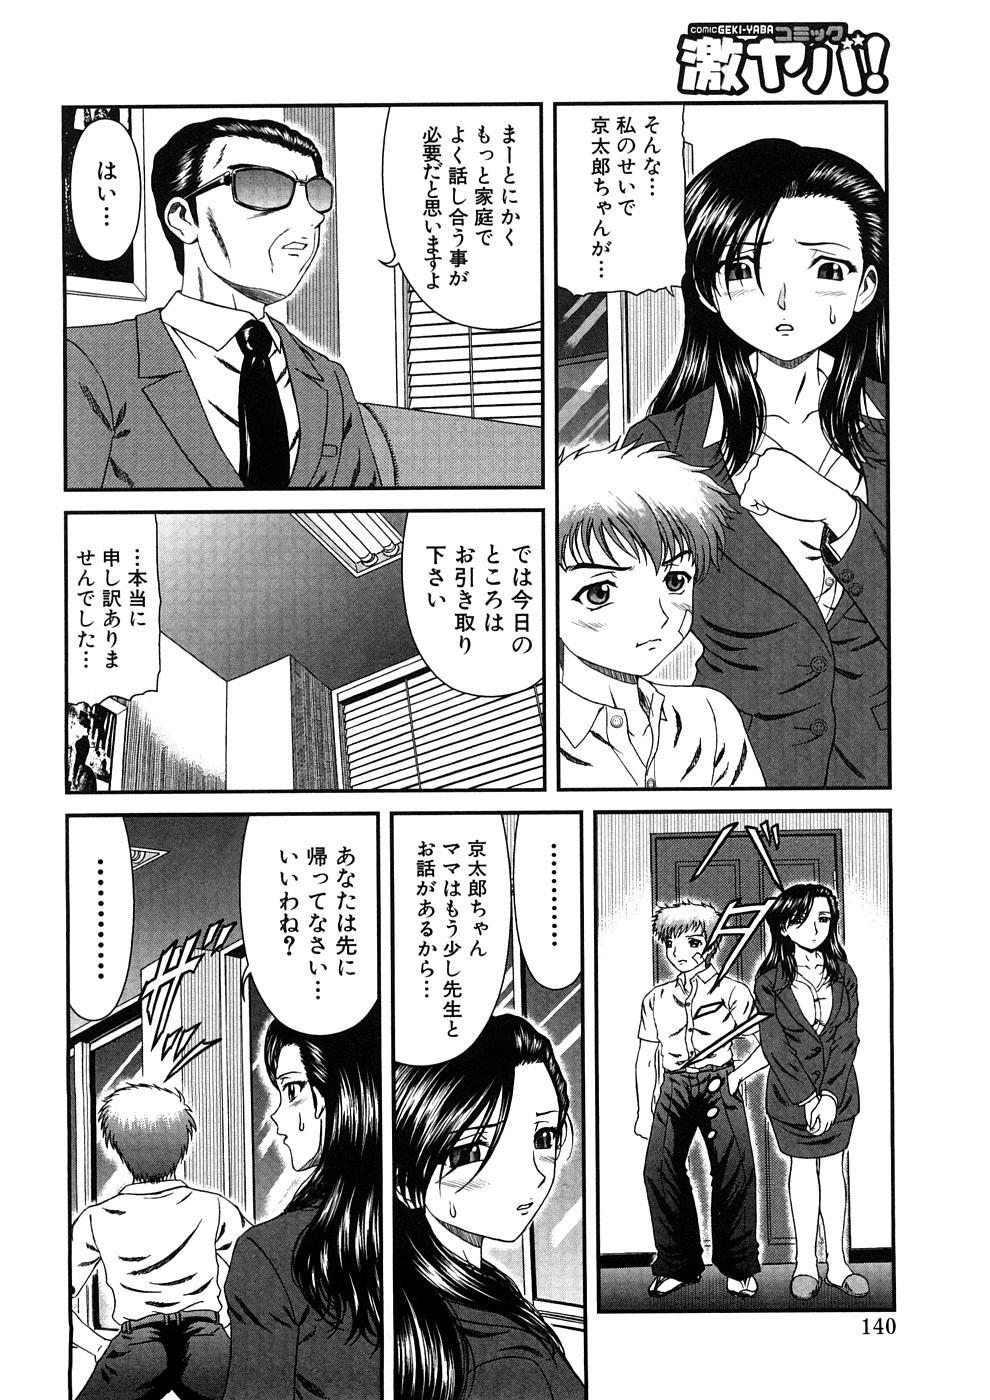 Geki Yaba Anthology Vol. 1 - Naka ni Dashite yo 140